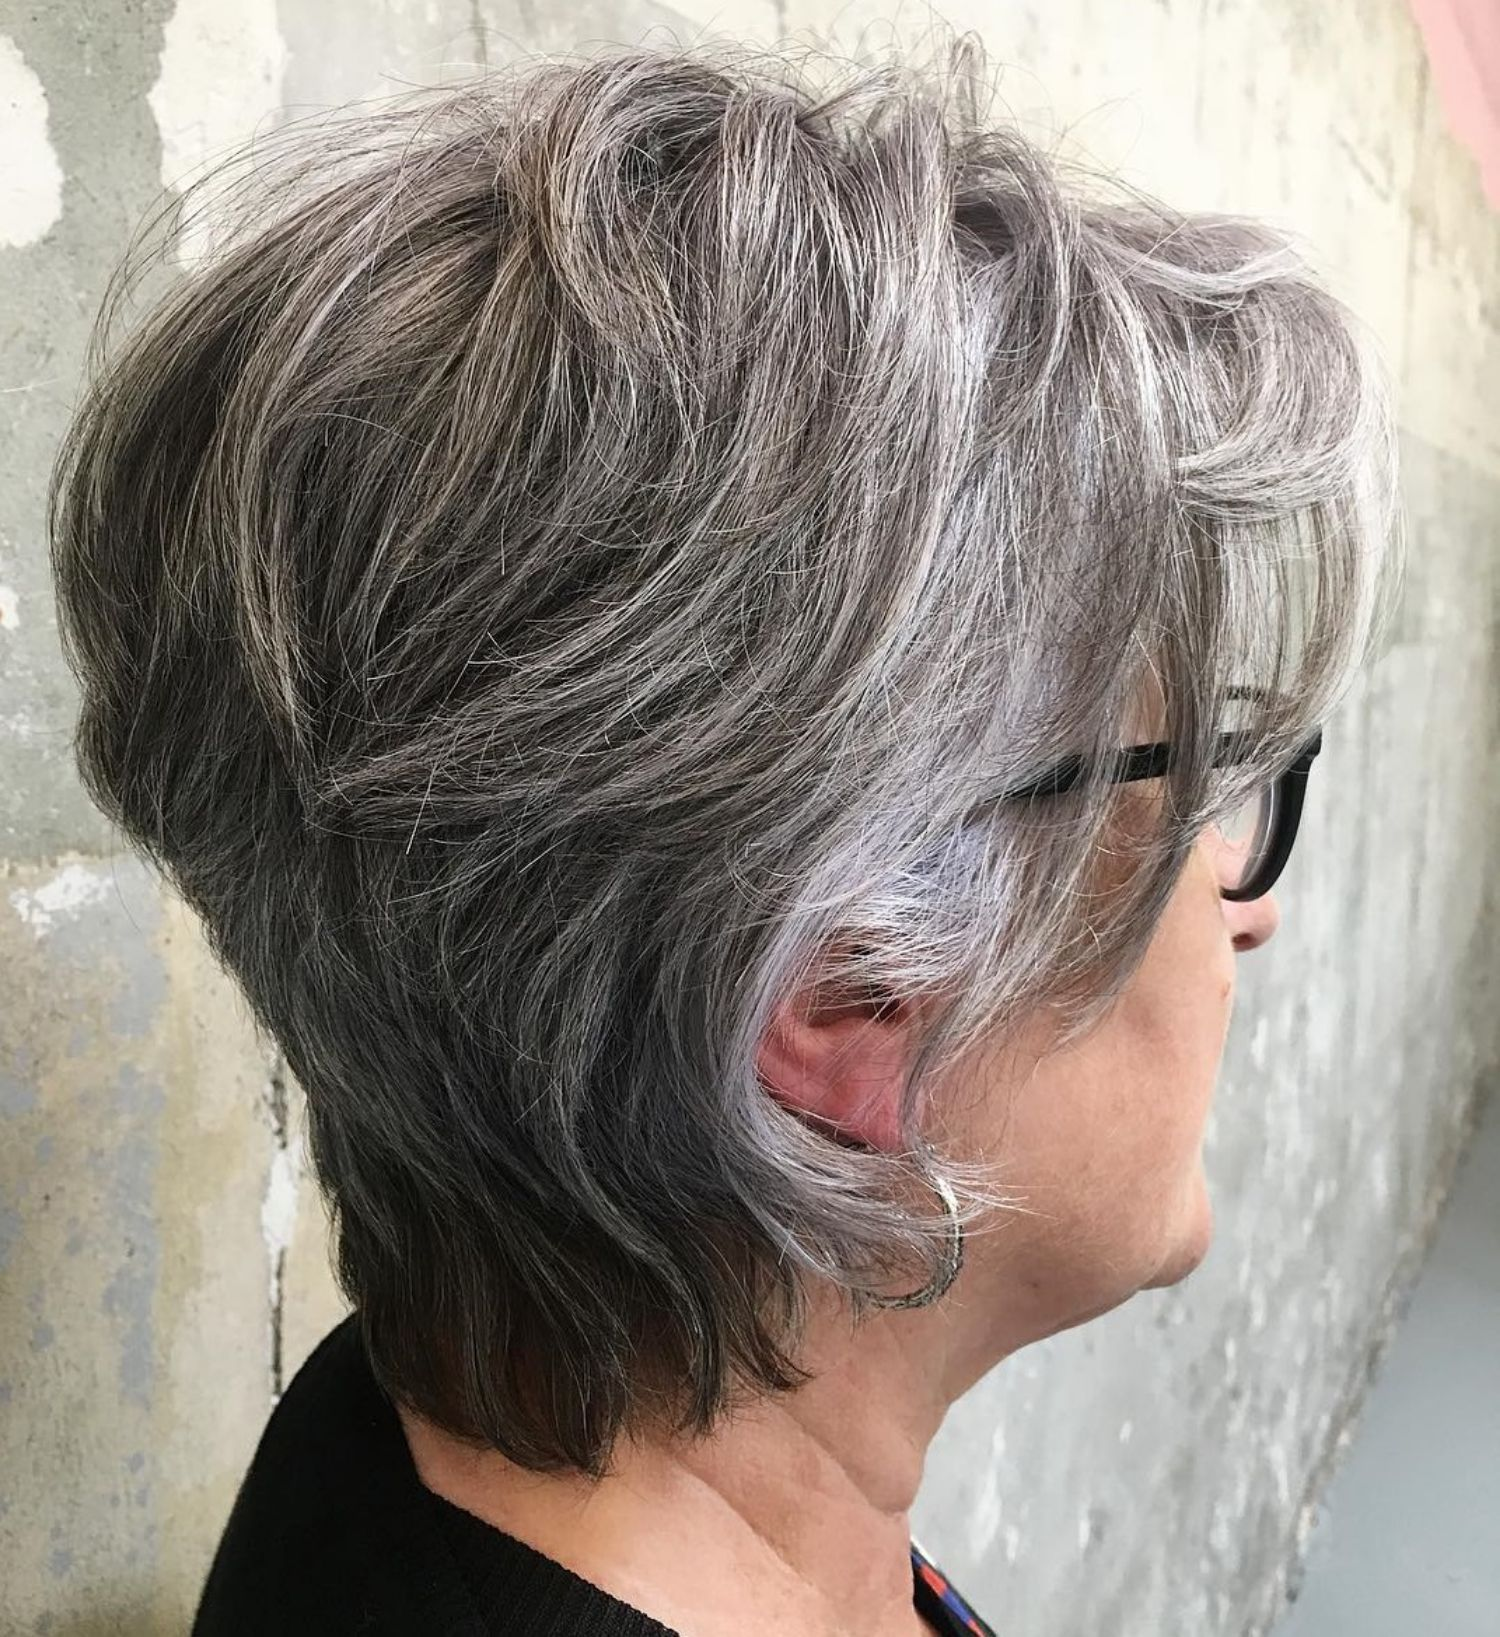 Damen grau kurzhaarfrisuren blond Kurzhaarfrisur Frauen